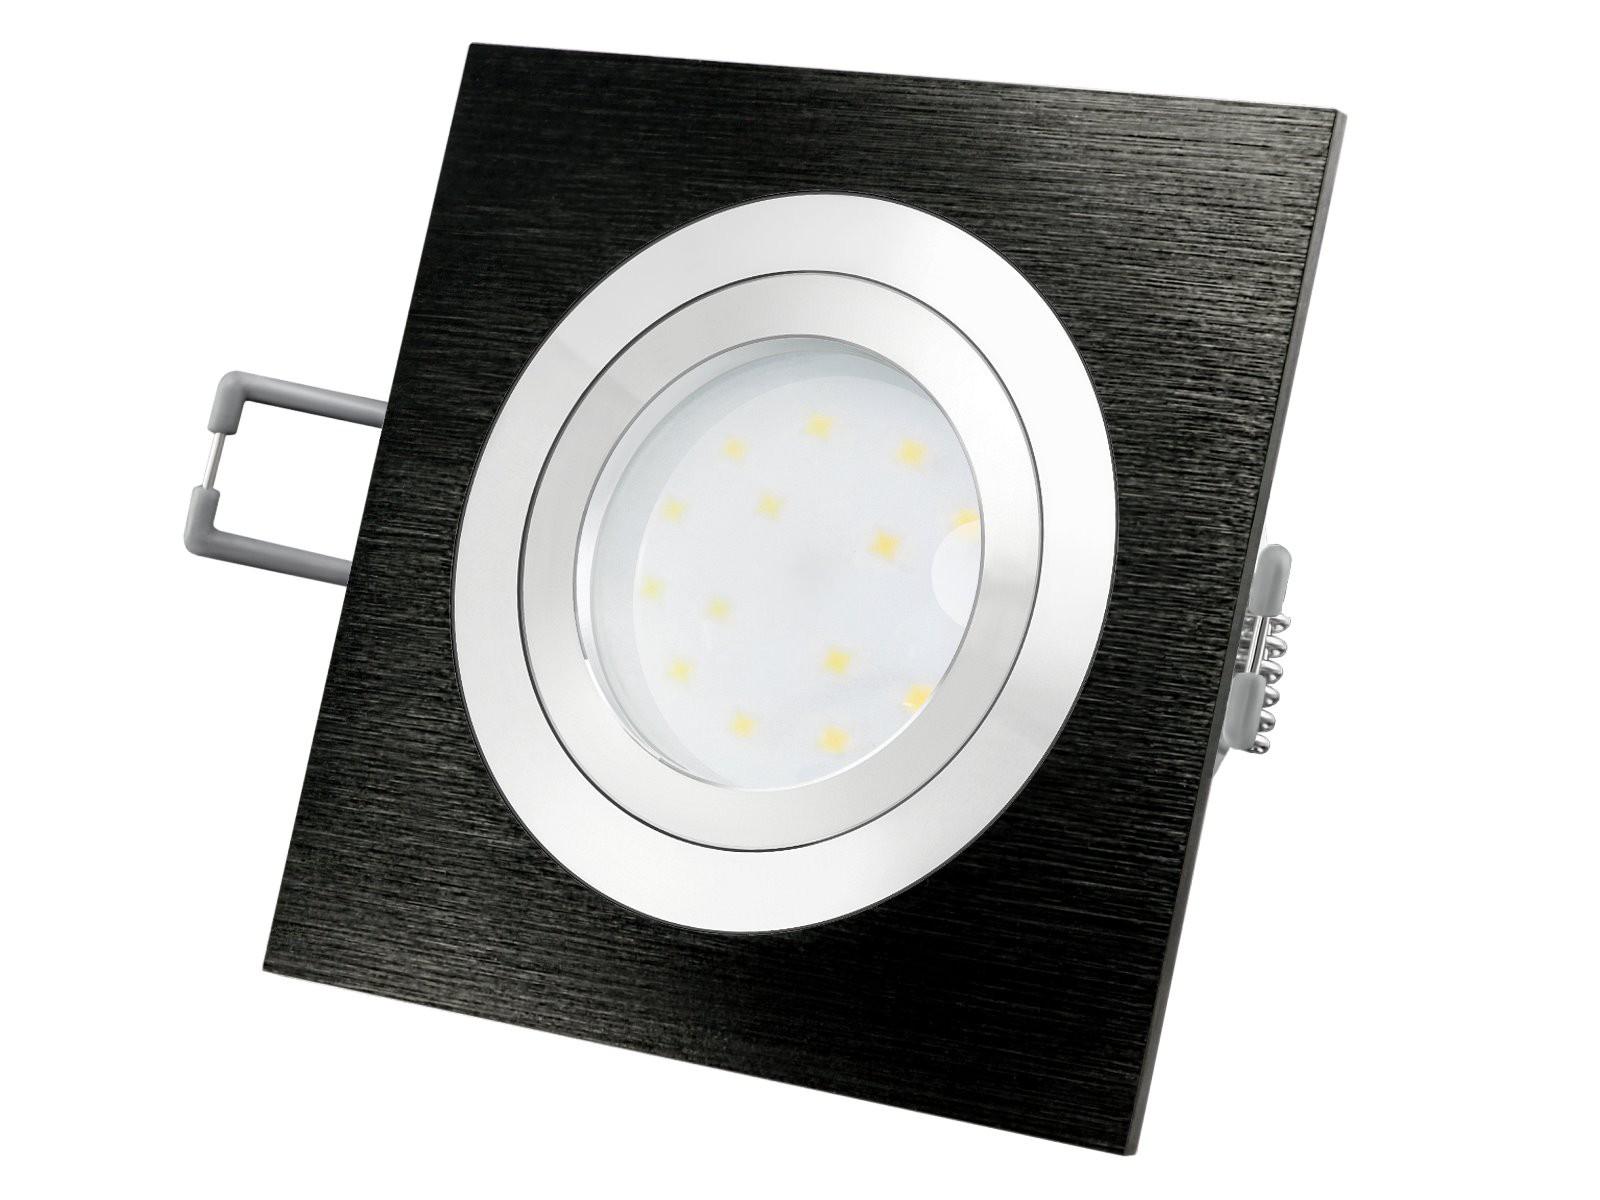 Decken LED Einbaustrahler Ultra flach dimmbar QW 20 eckig chrom ...